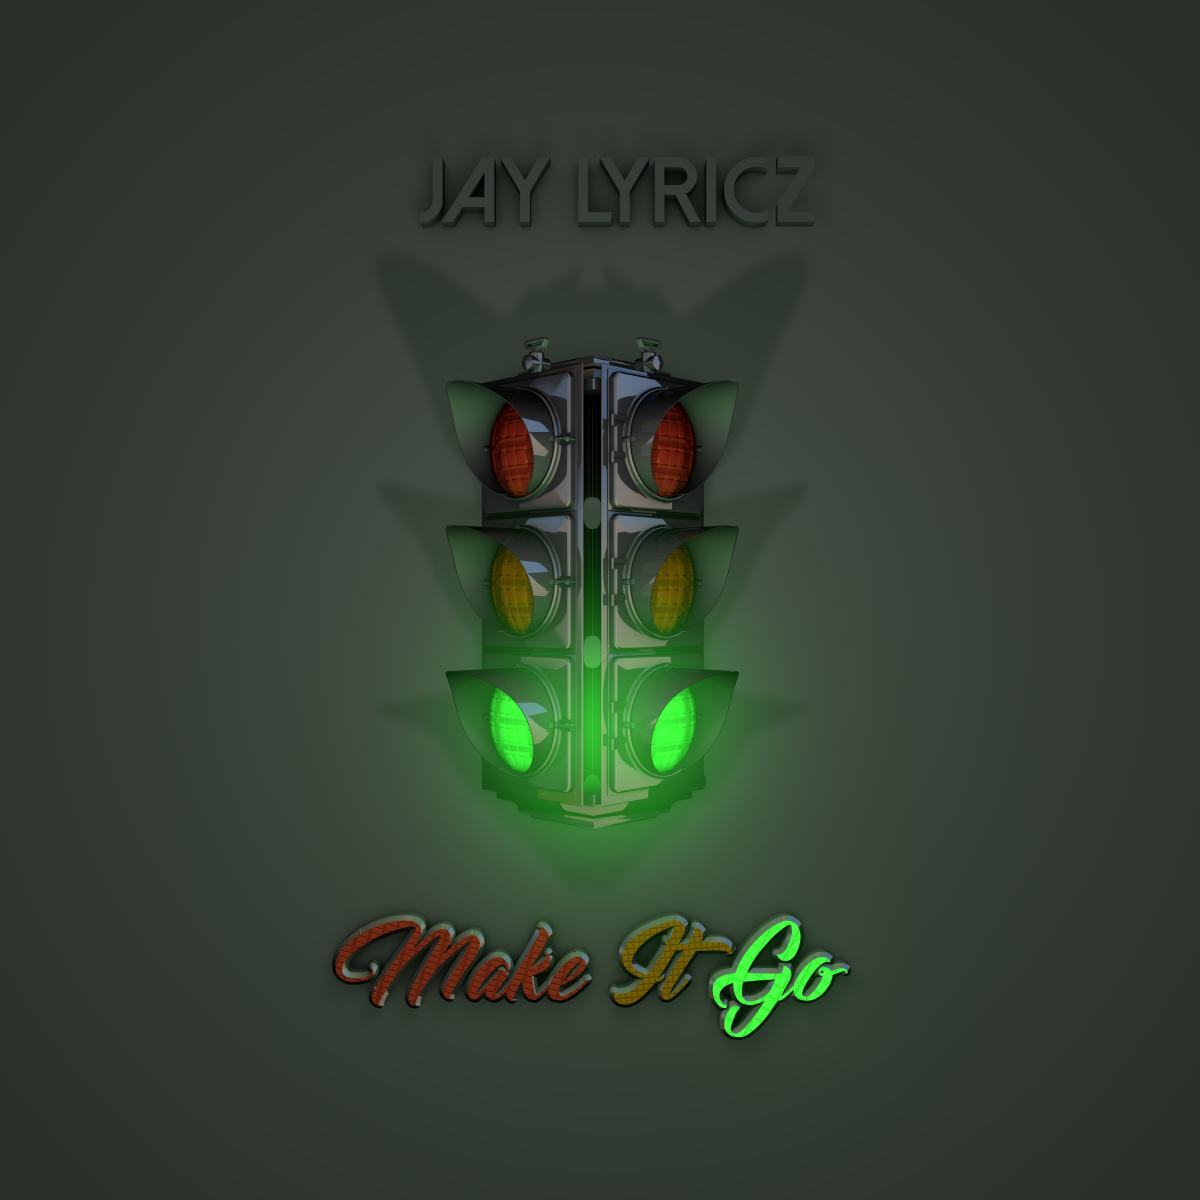 Logo from Jay Lyricz current single, 'Make It Go'